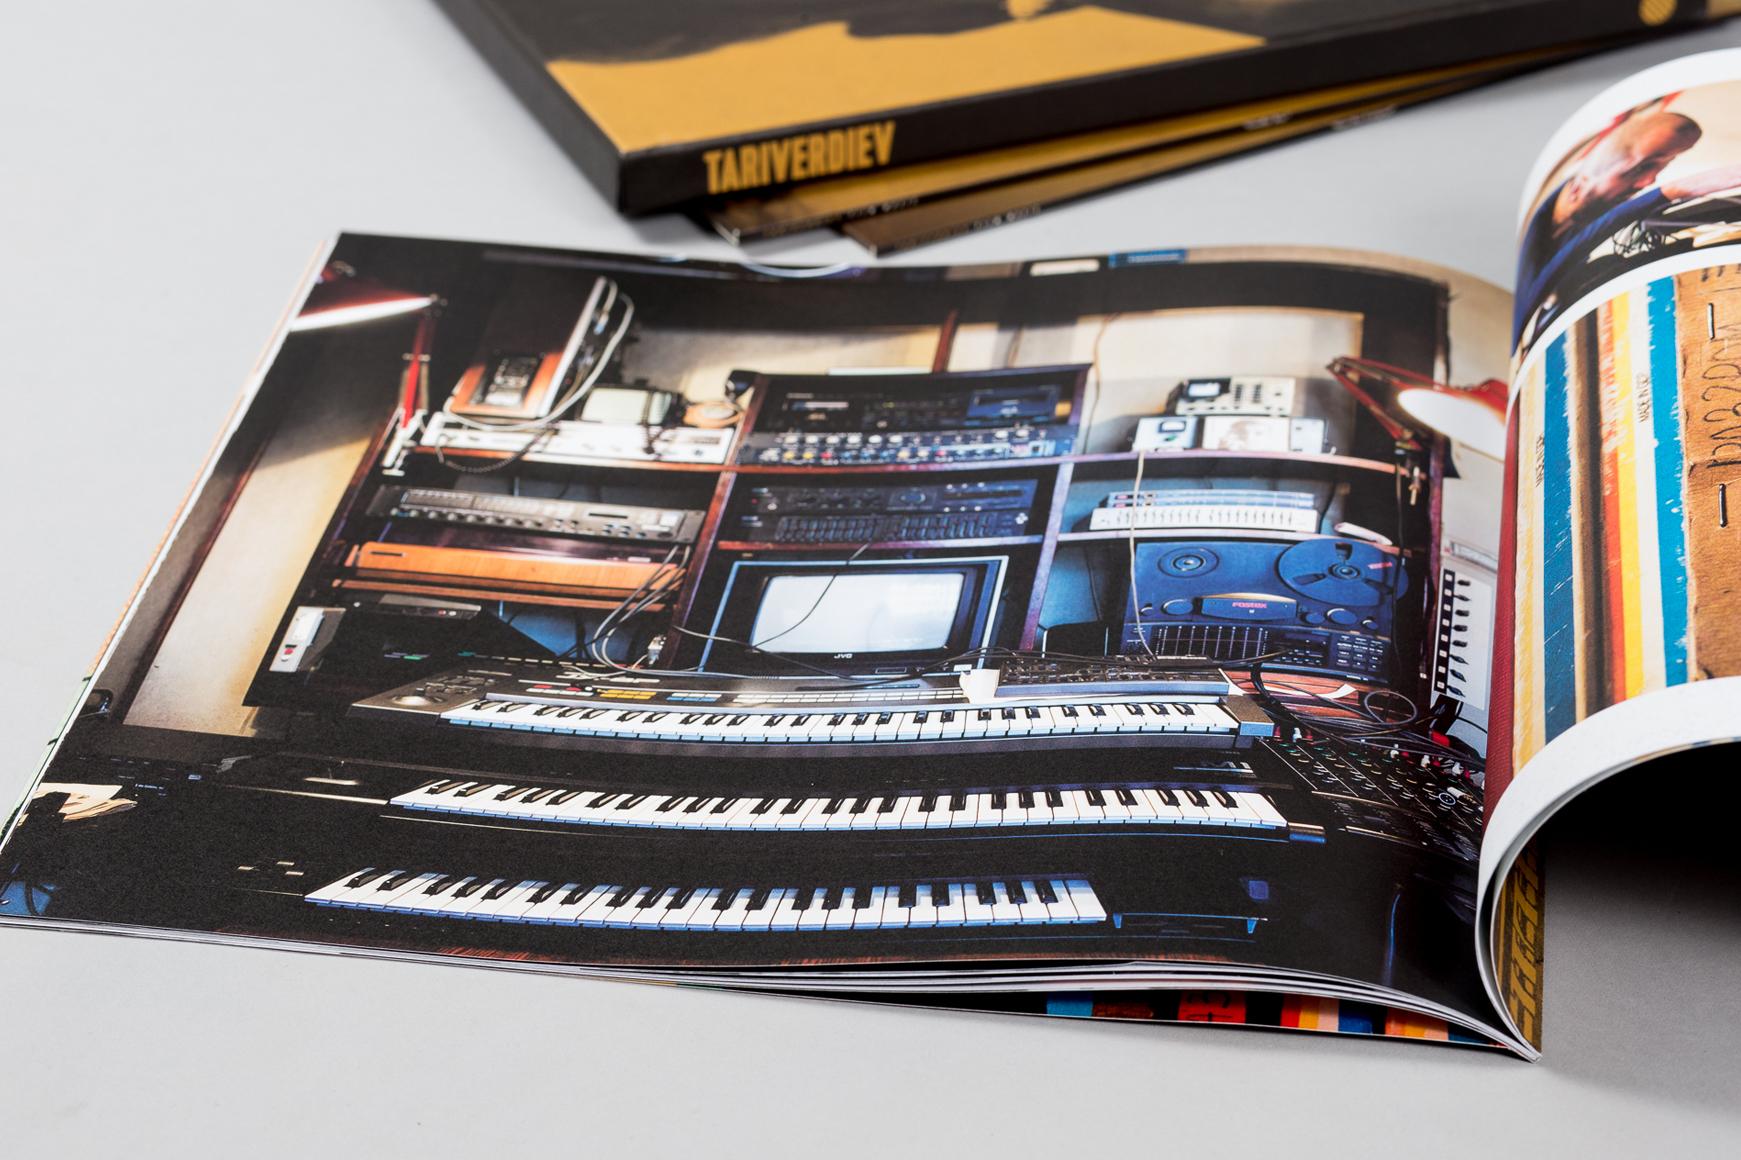 ©-The-Vinyl-Factory-Tariverdiev-Vinyl-Release-Photography-Michael-Wilkin_0004_1-16-of-30.jpg